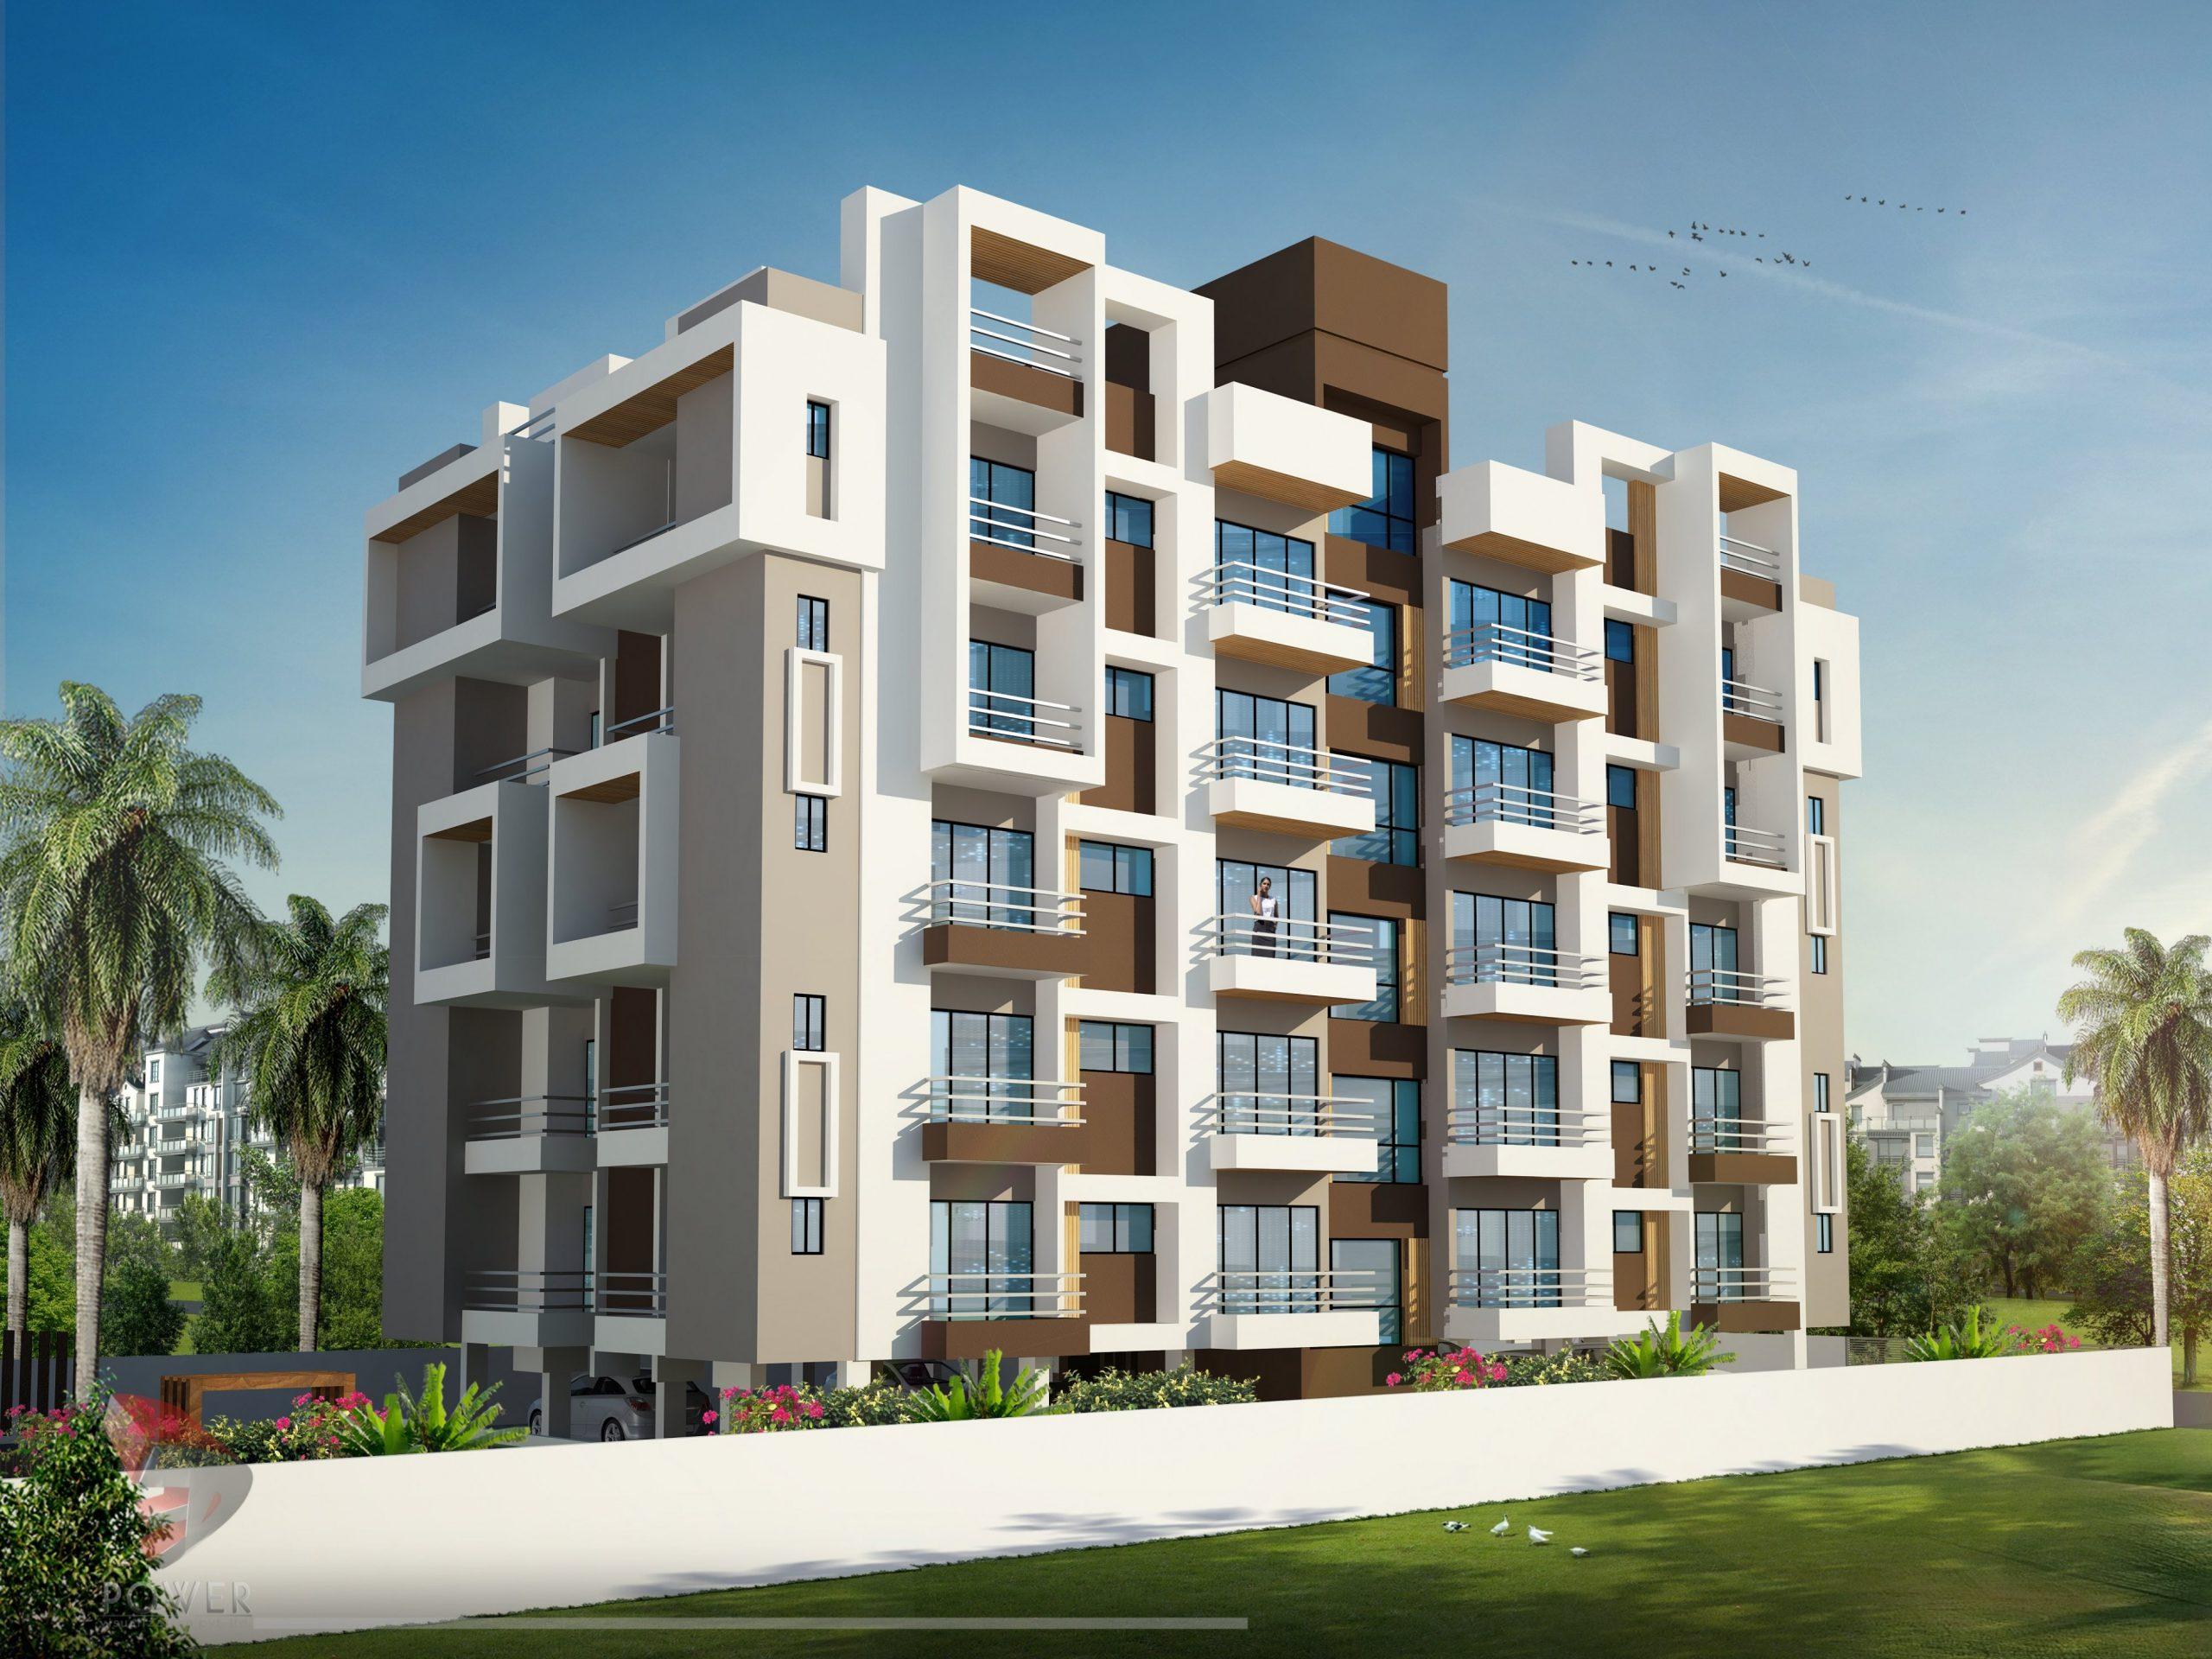 Apartment Elevation Designing  11D Architectural Rendering  - Apartment Design Elevation